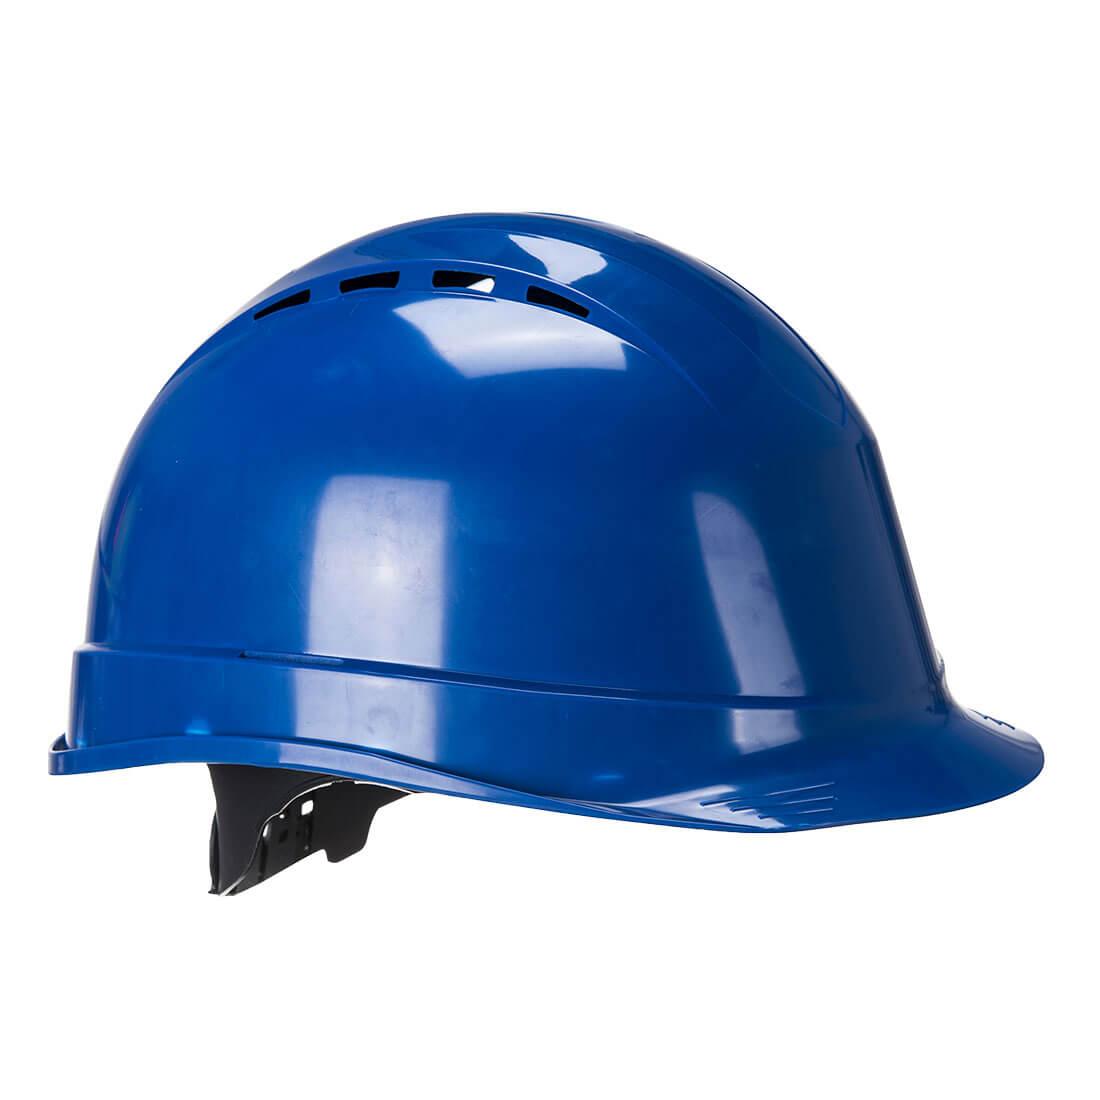 Portwest Arrow Safety Helmet